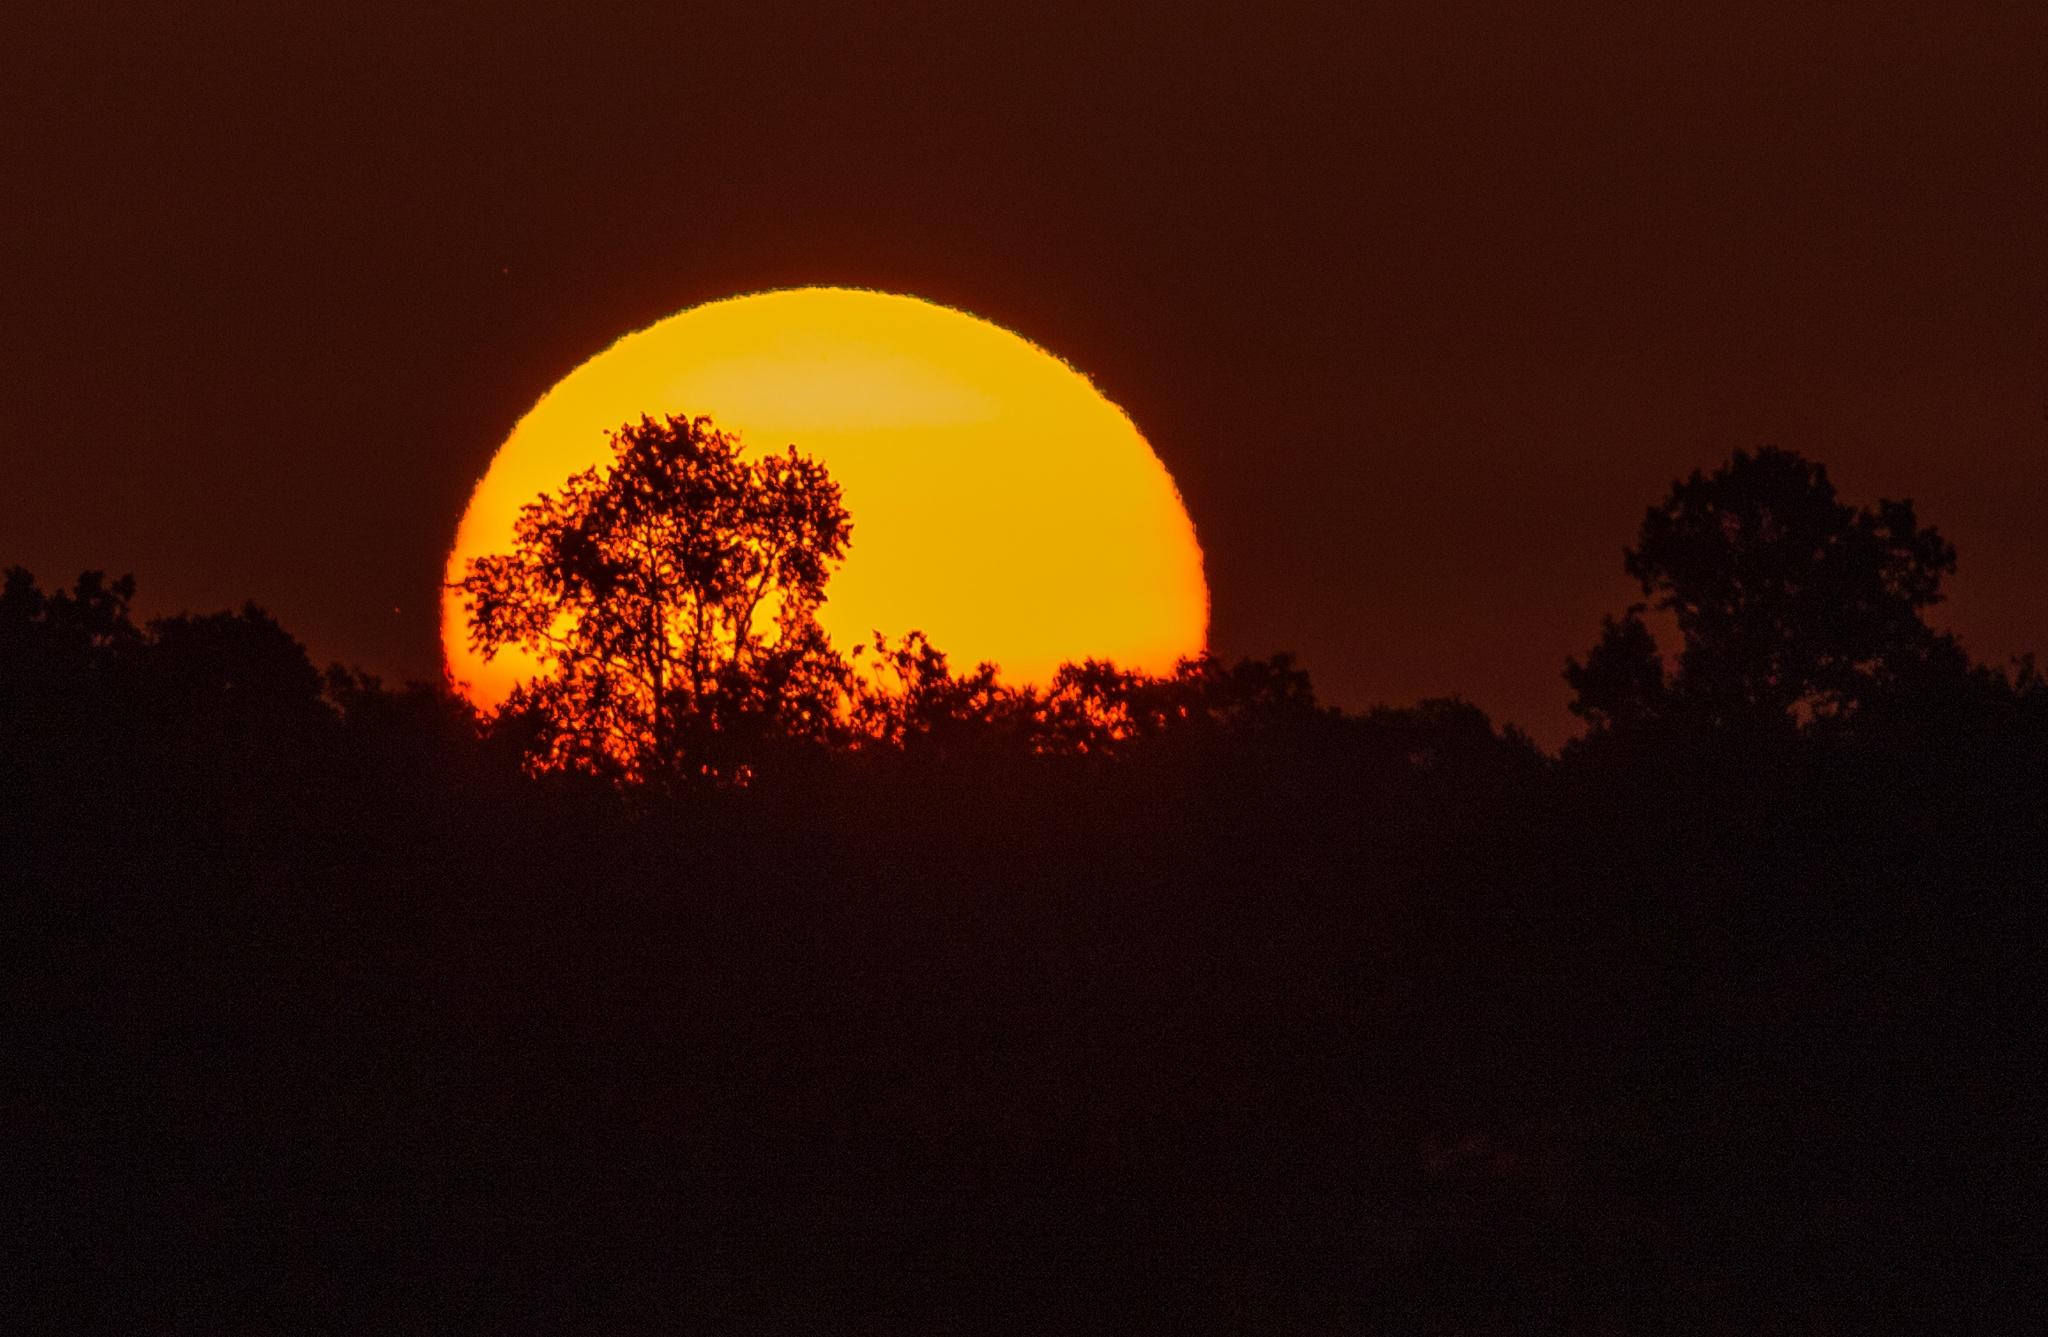 6/24/16 Sunrise Lake Apopka by Barry Melamed